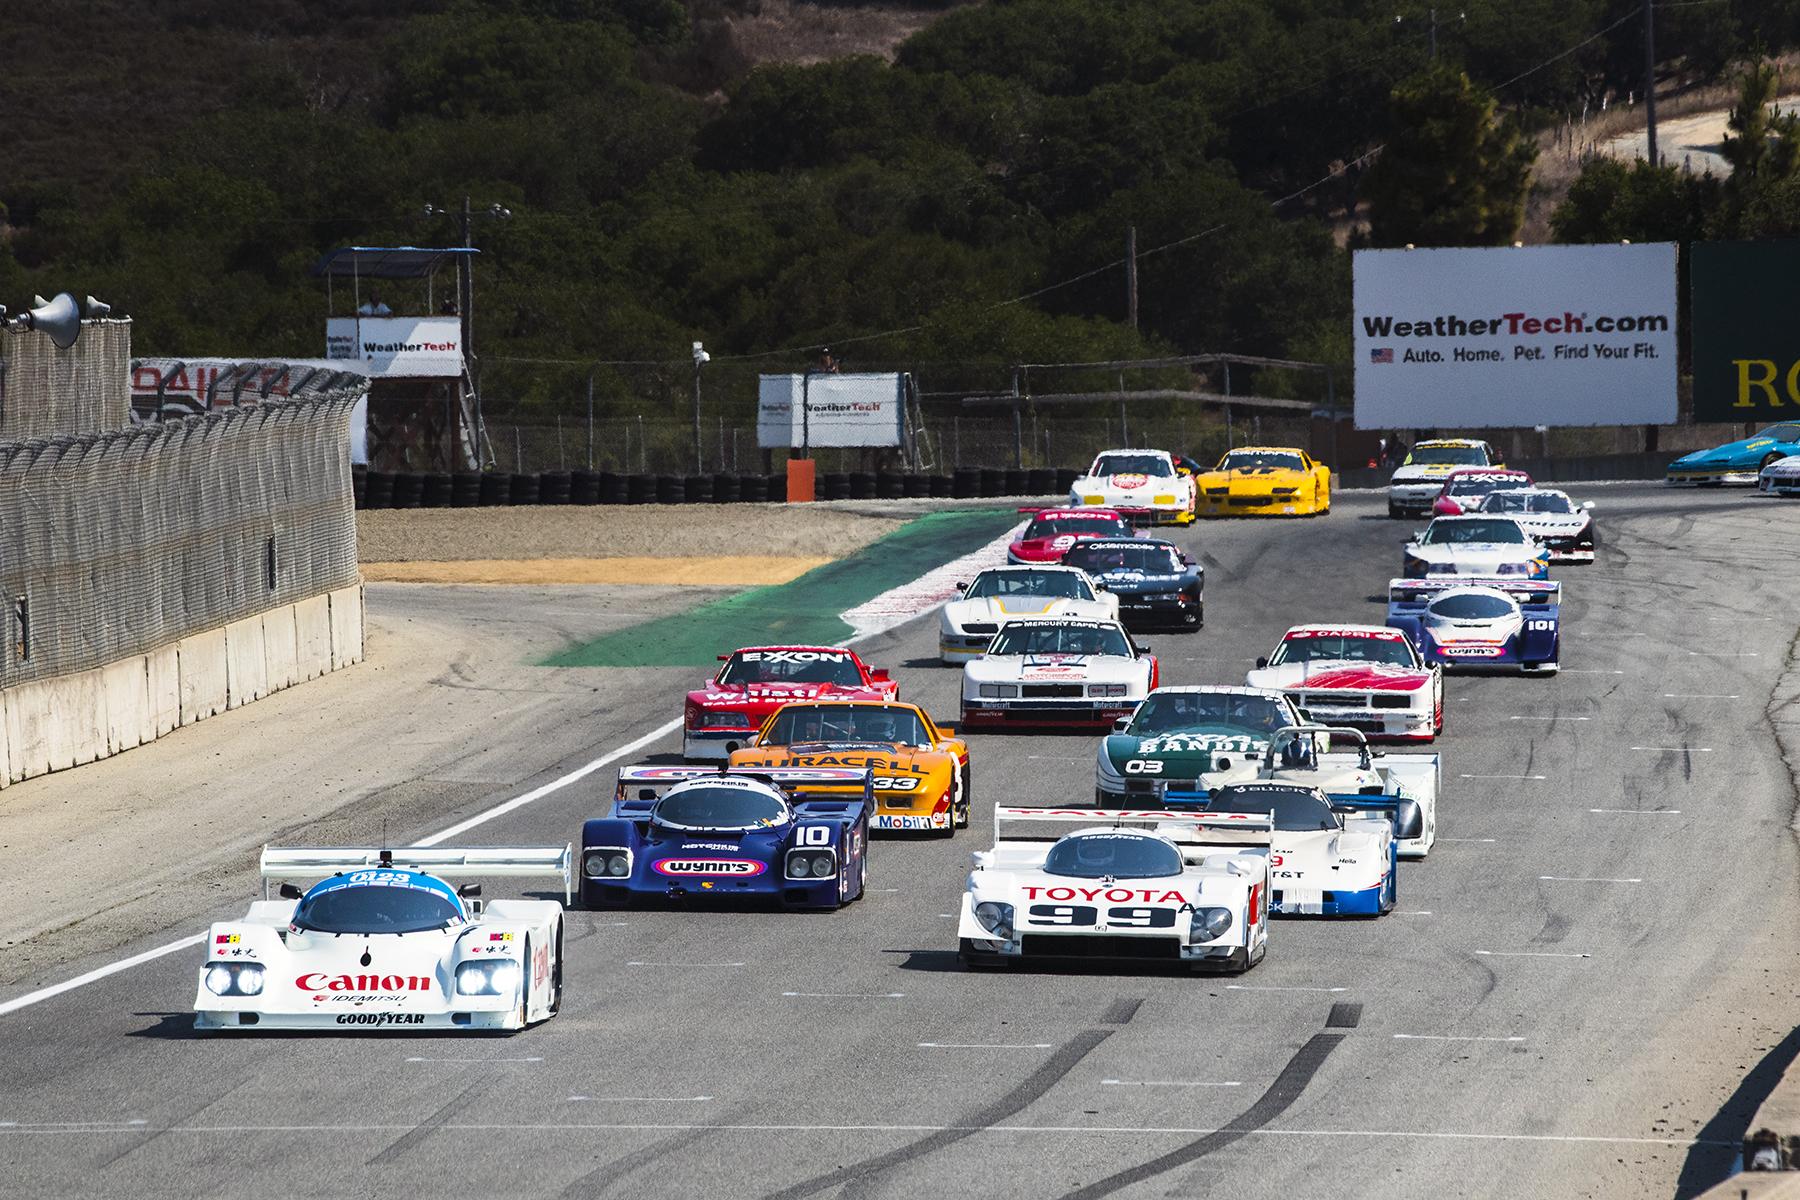 2021 Rolex Monterey Motorsports Reunion Recap